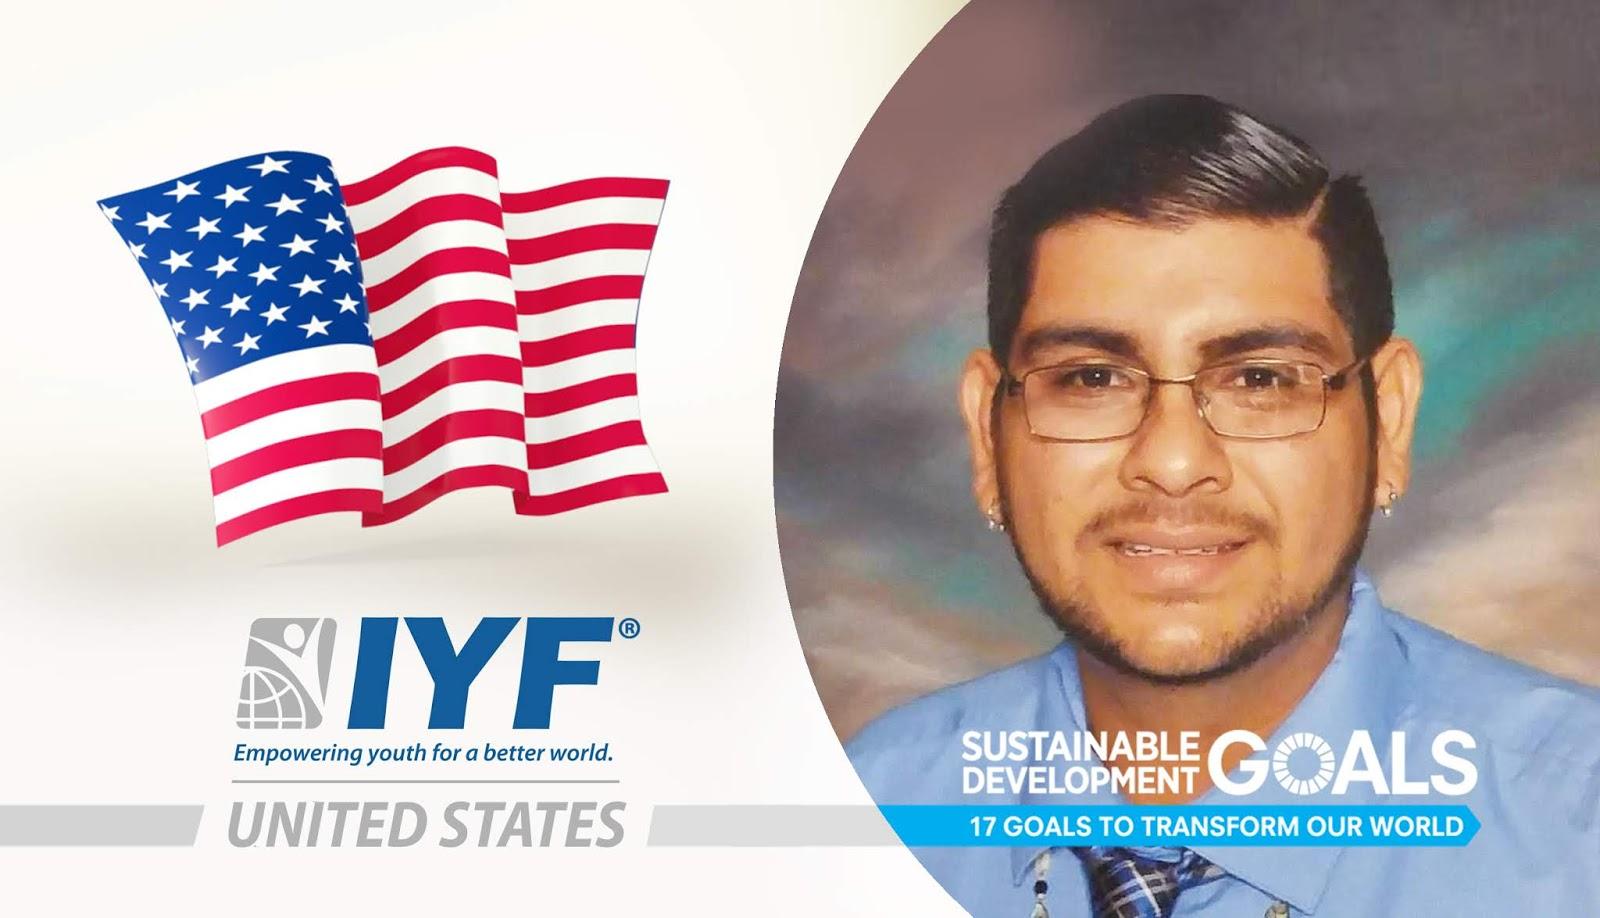 Ramon Montano Marquez, IYF Representative in United States